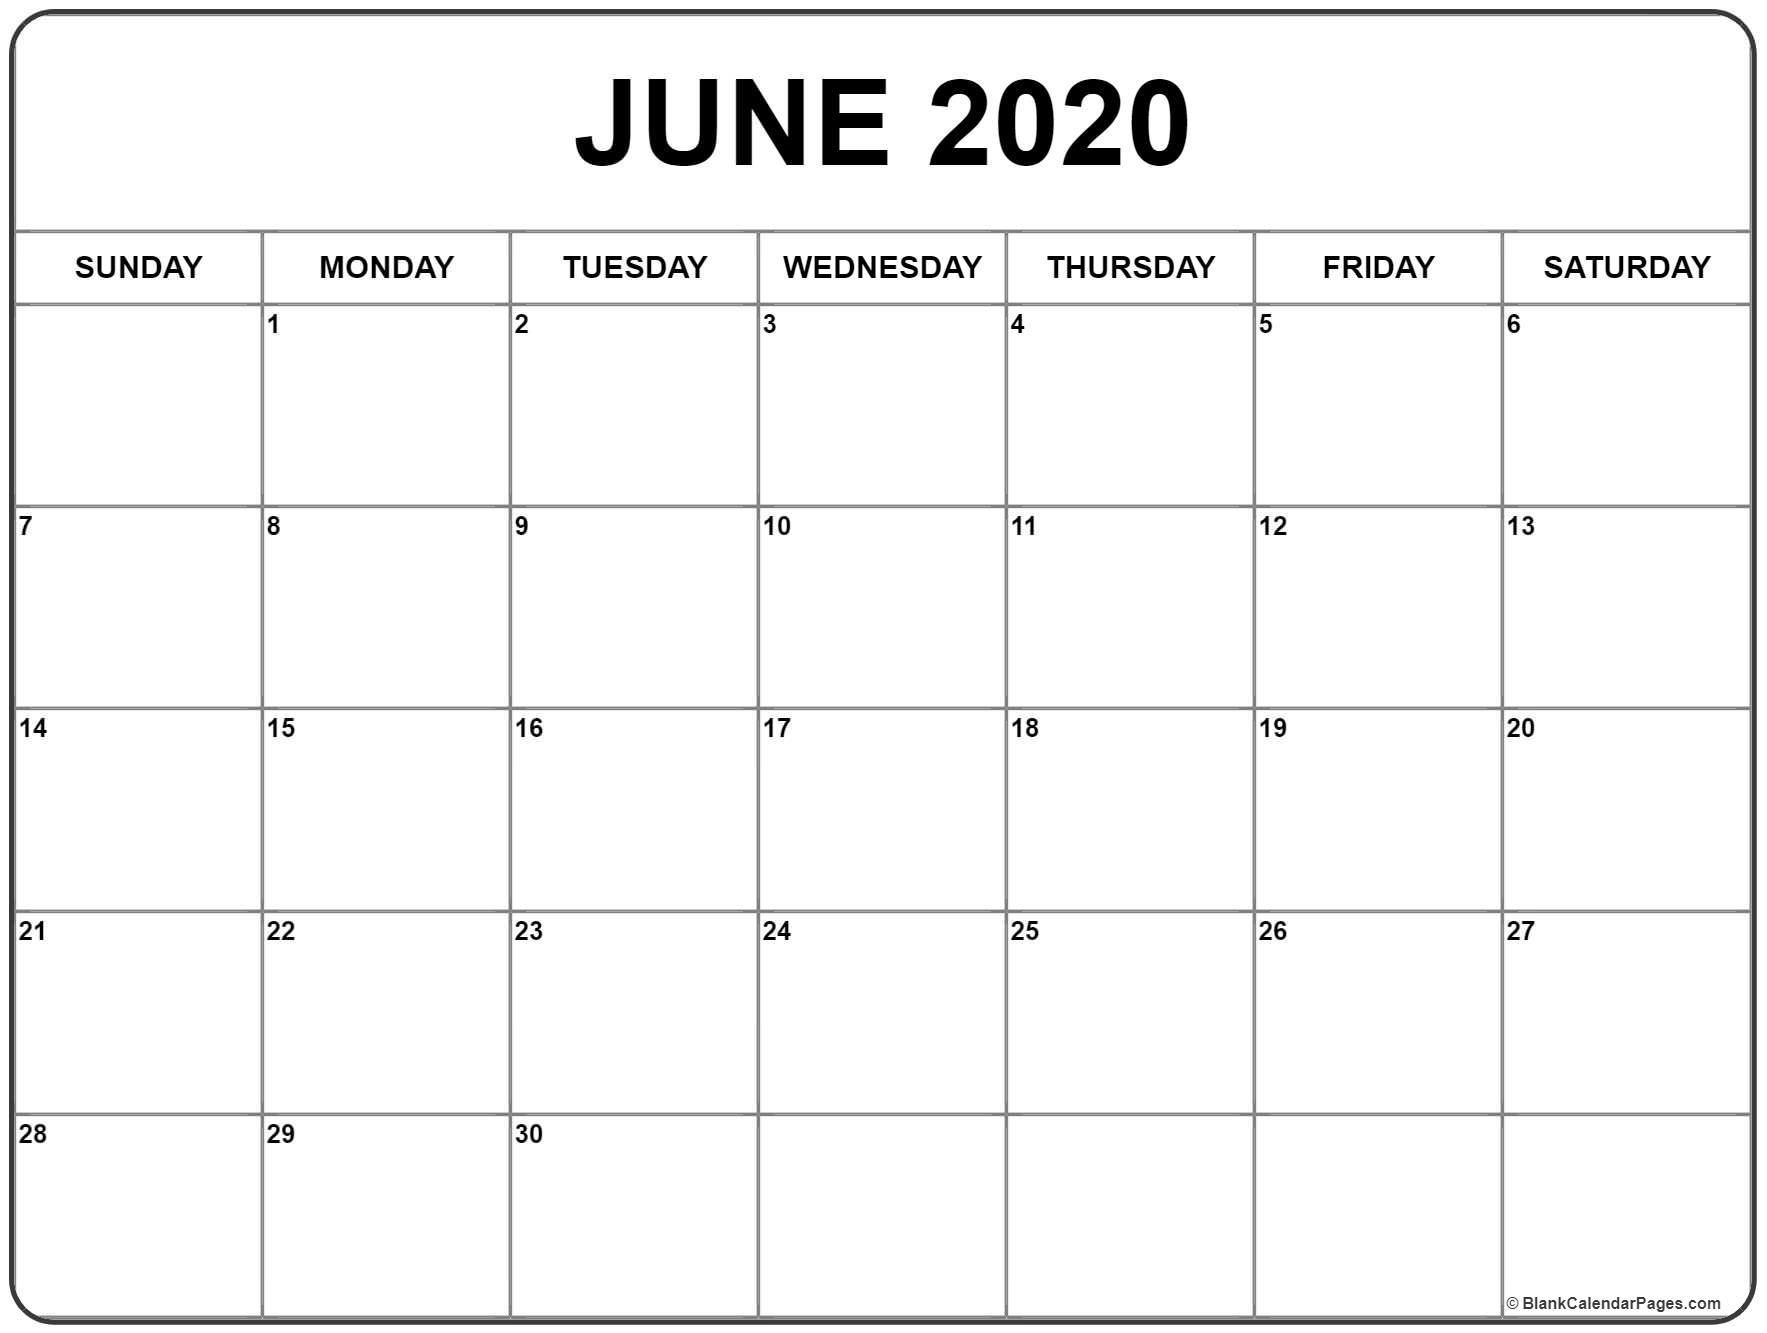 June 2020 Calendar | Free Printable Monthly Calendars regarding Free Printable Calendar July 2019-June 2020